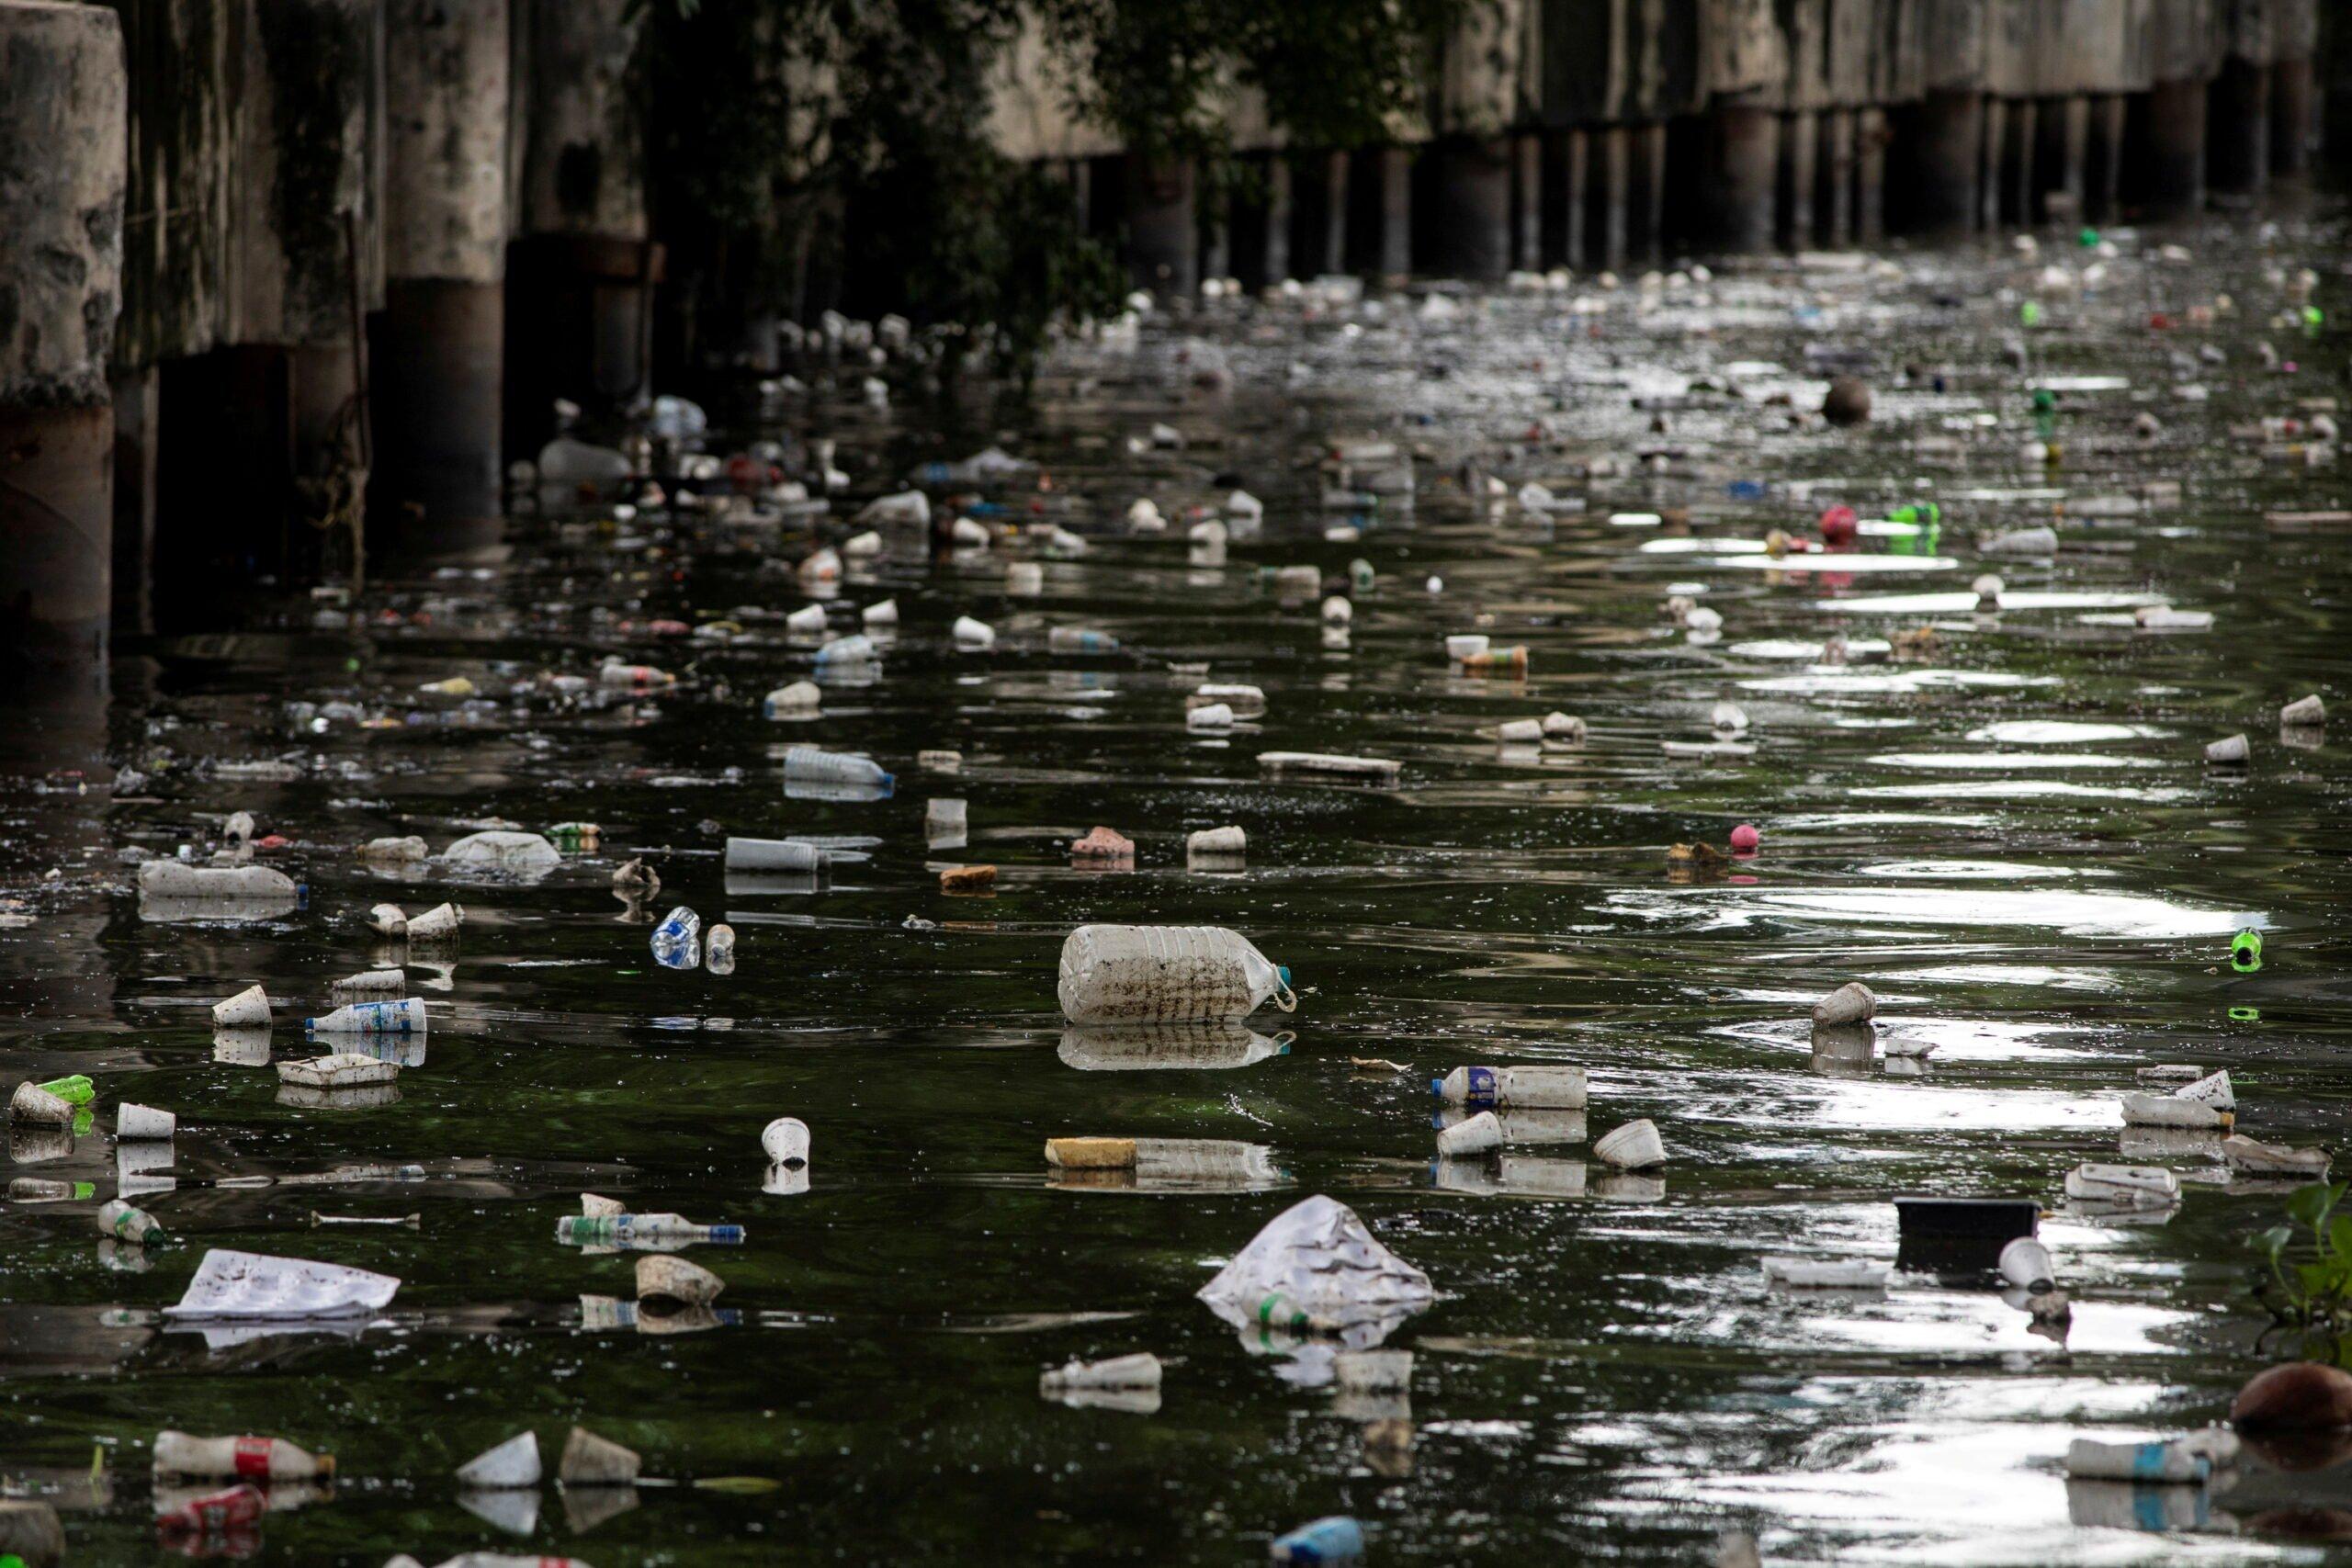 tides of trash in pasig river